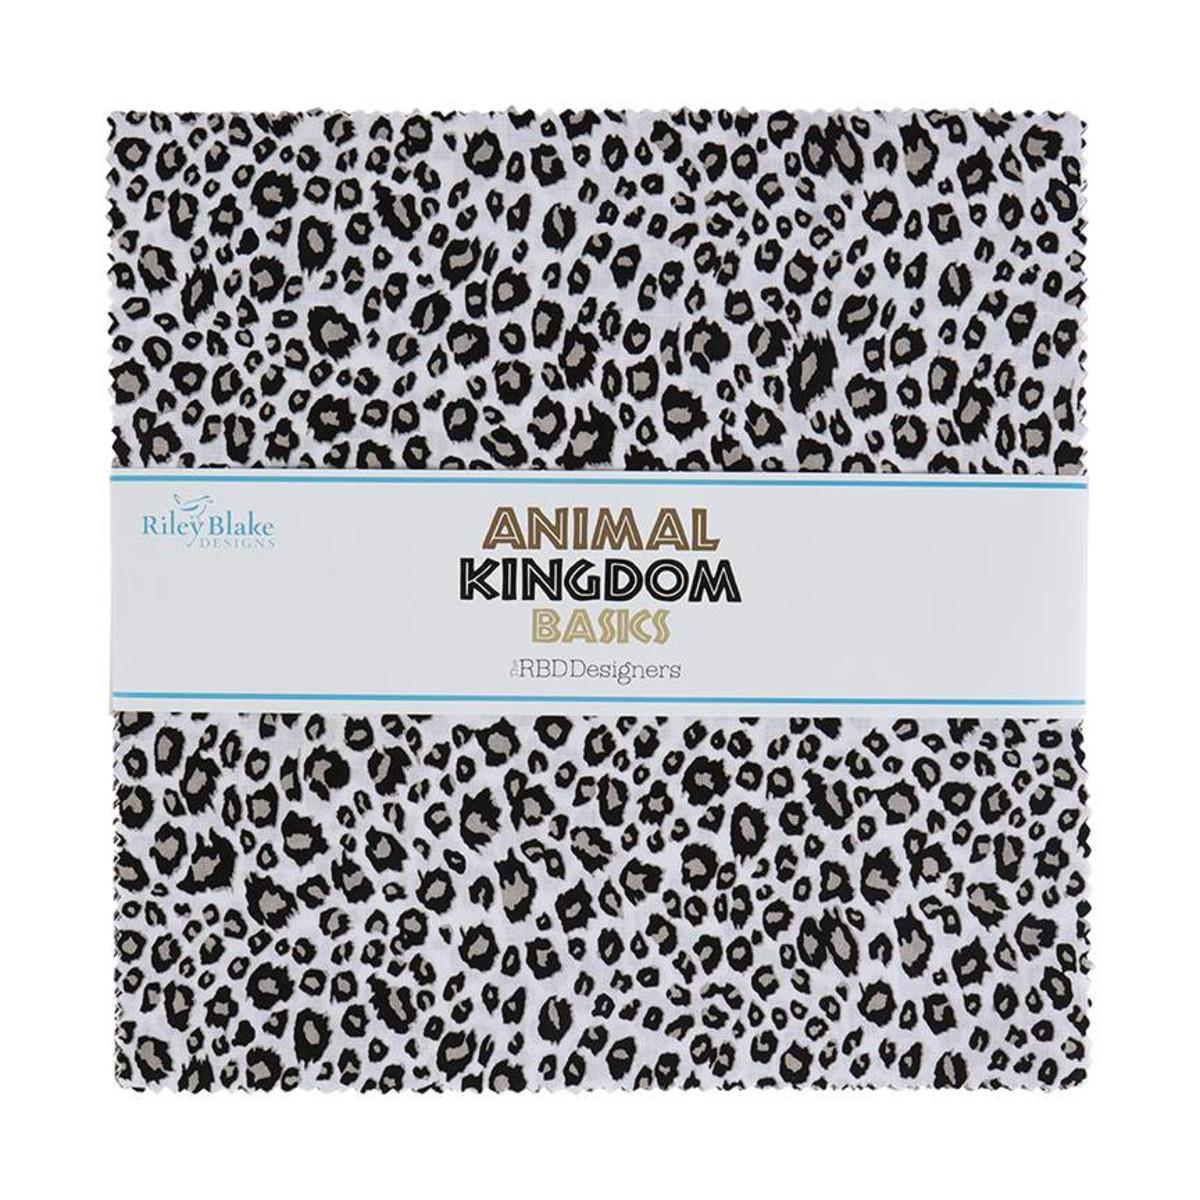 Riley Blake Layer Cake - Animal Kingdom by The RBD Designers